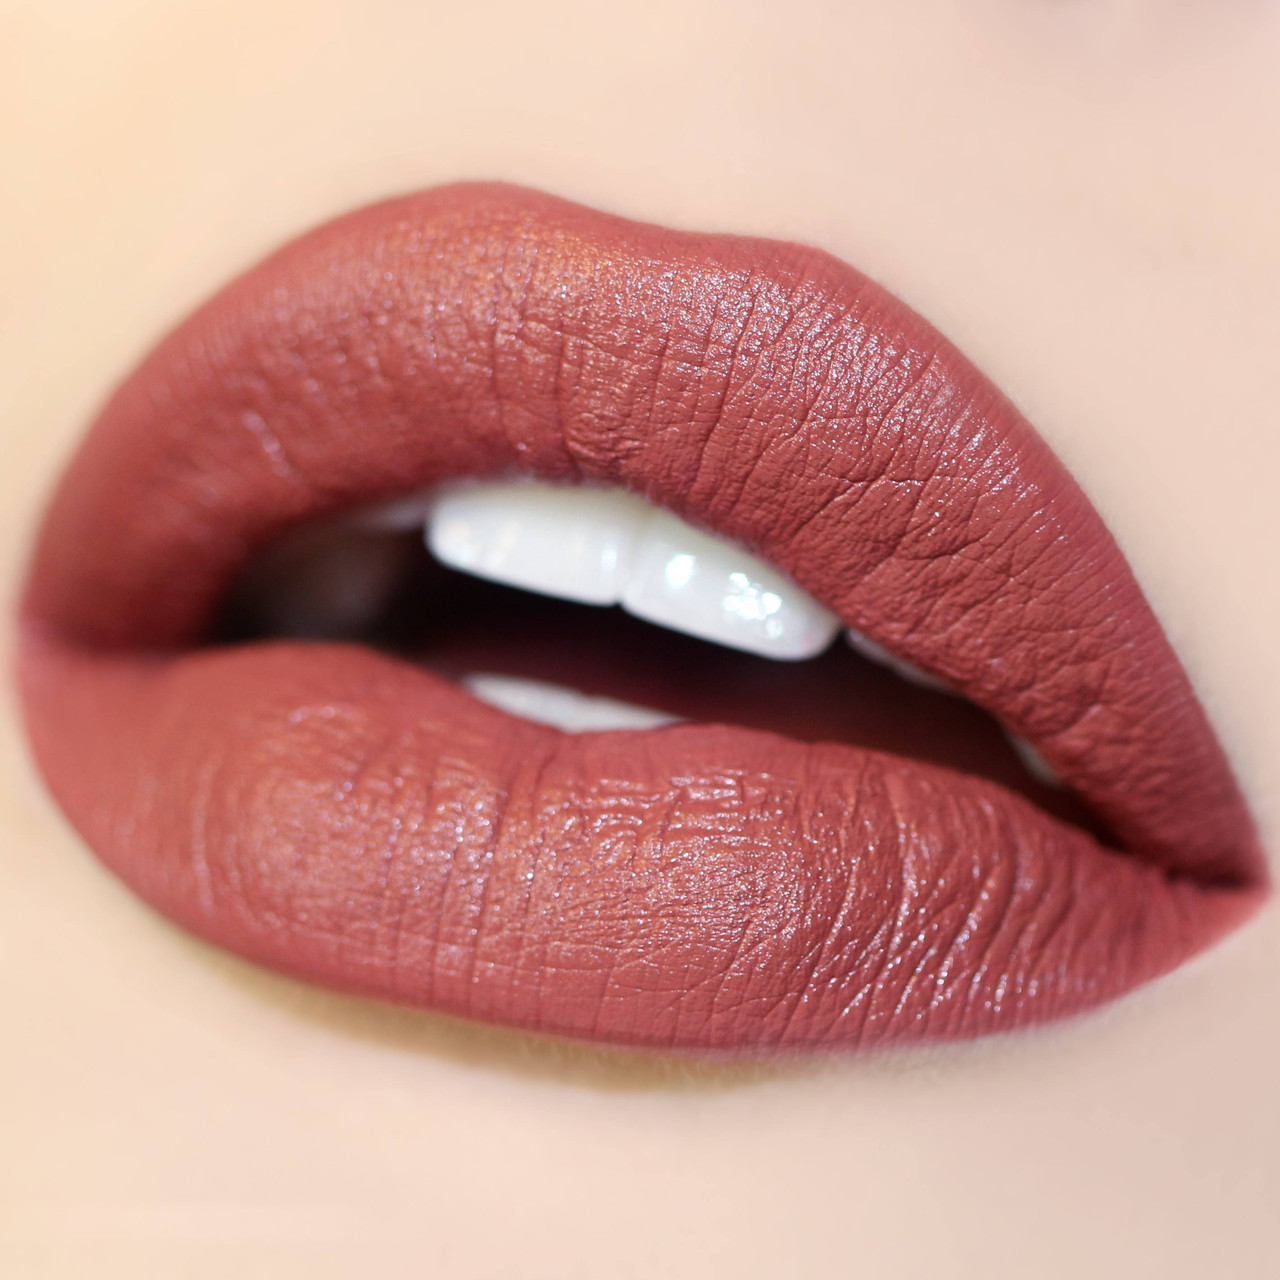 Сатиновая помада для губ ColourPop - Frick N' Frack